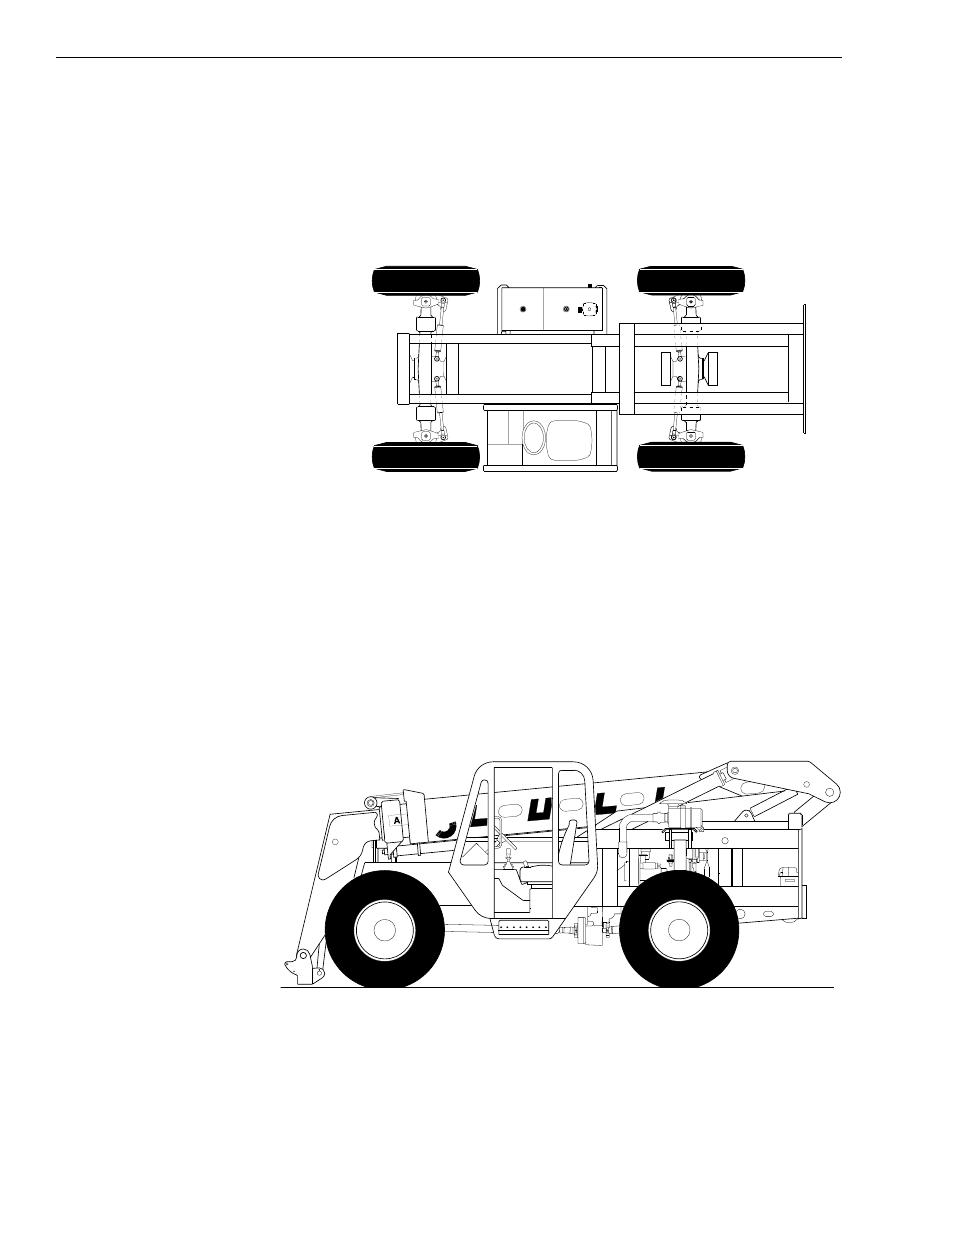 fender baja telecaster wiring diagram , 1997 pontiac sunfire fuse box  diagram , 92 s10 fuse diagram , 1972 yamaha 250 wire diagram , fxdwg dash  switch